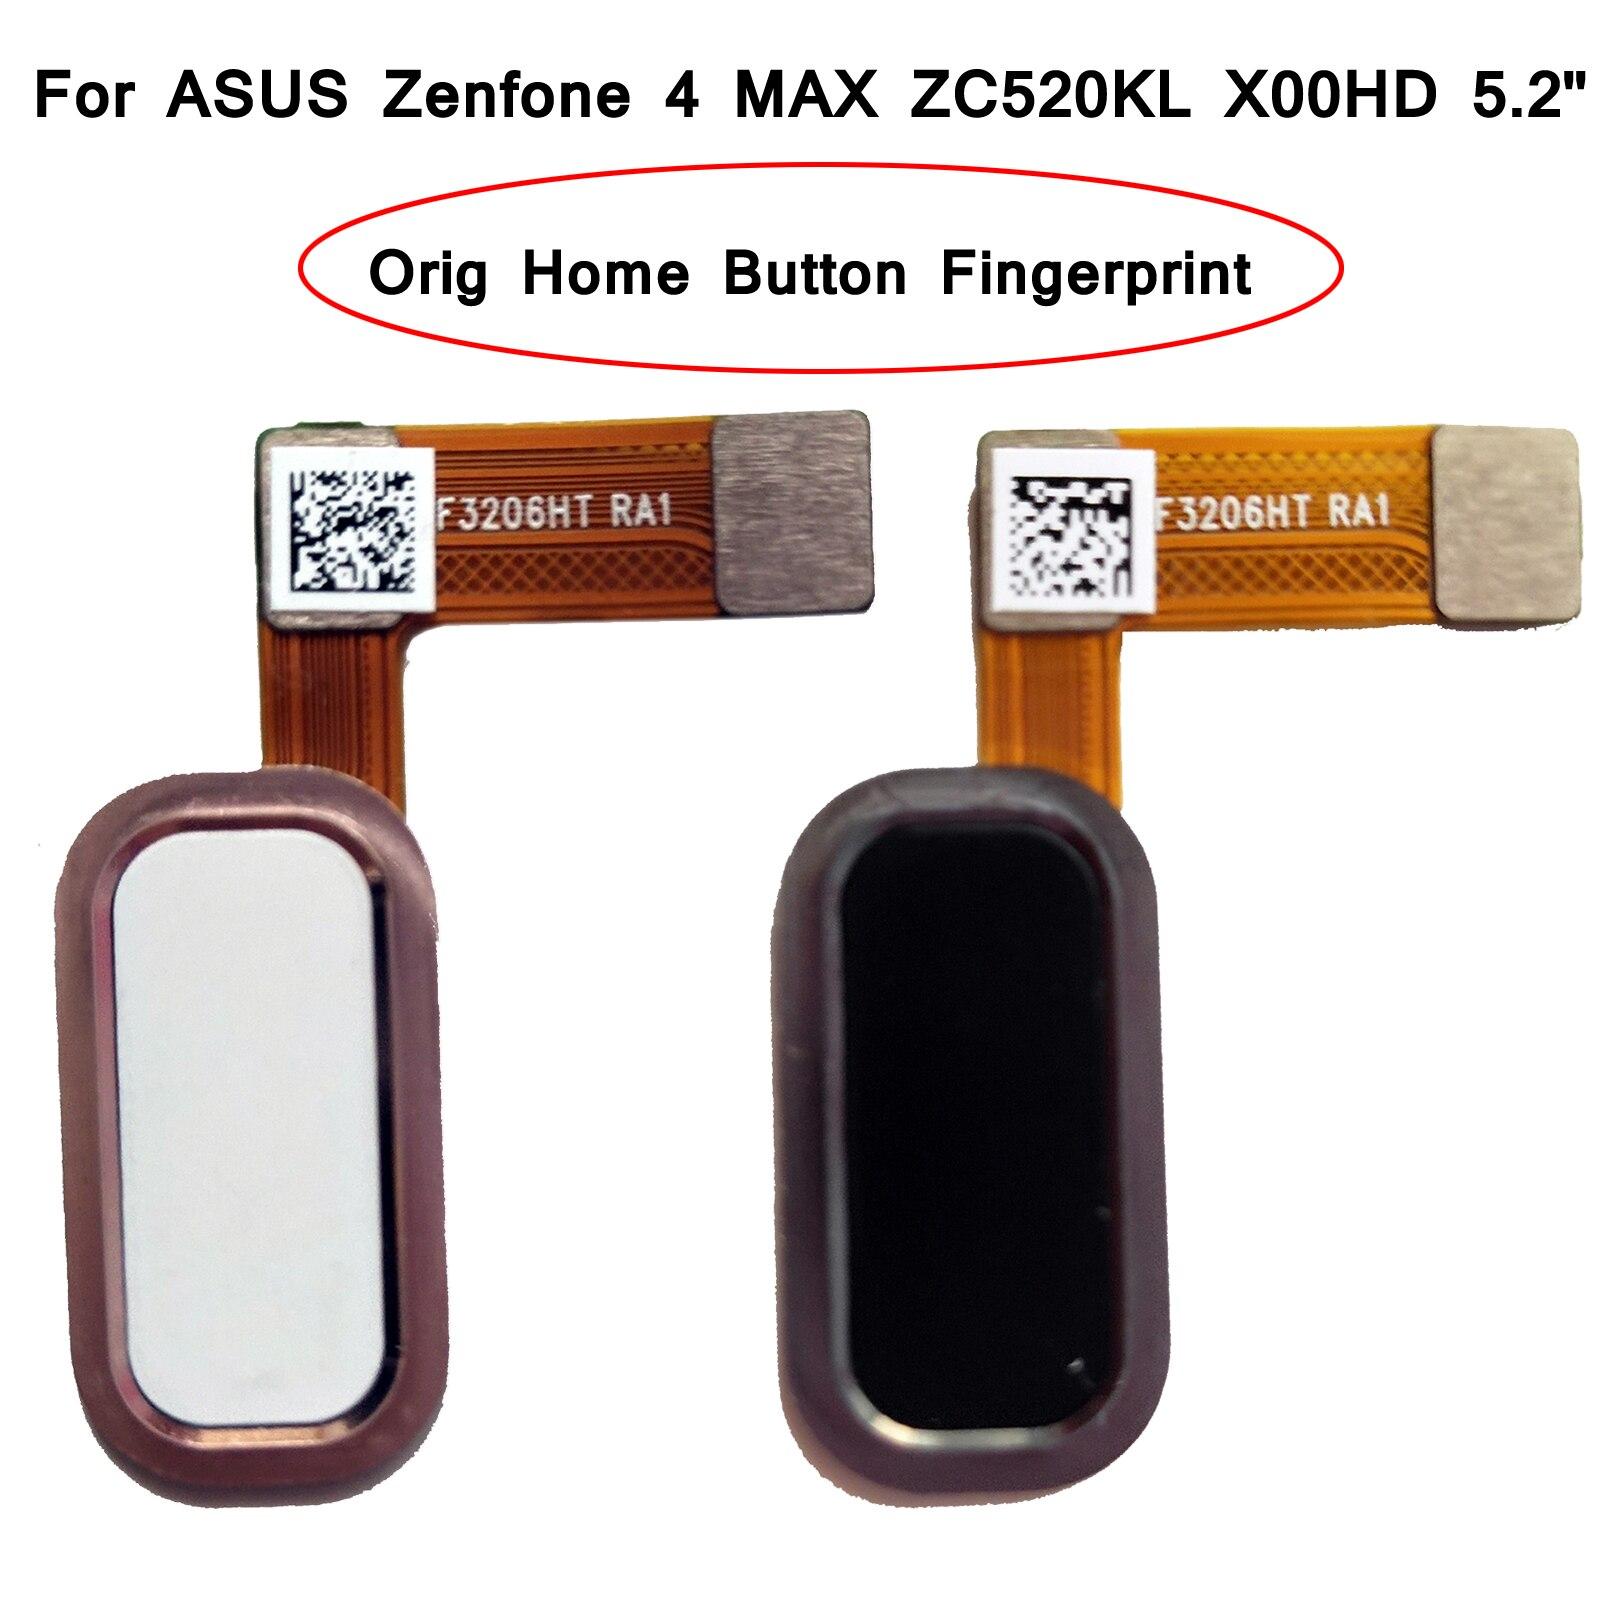 Shyueda For ASUS Zenfone 4 MAX ZC520KL X00HD 5.2